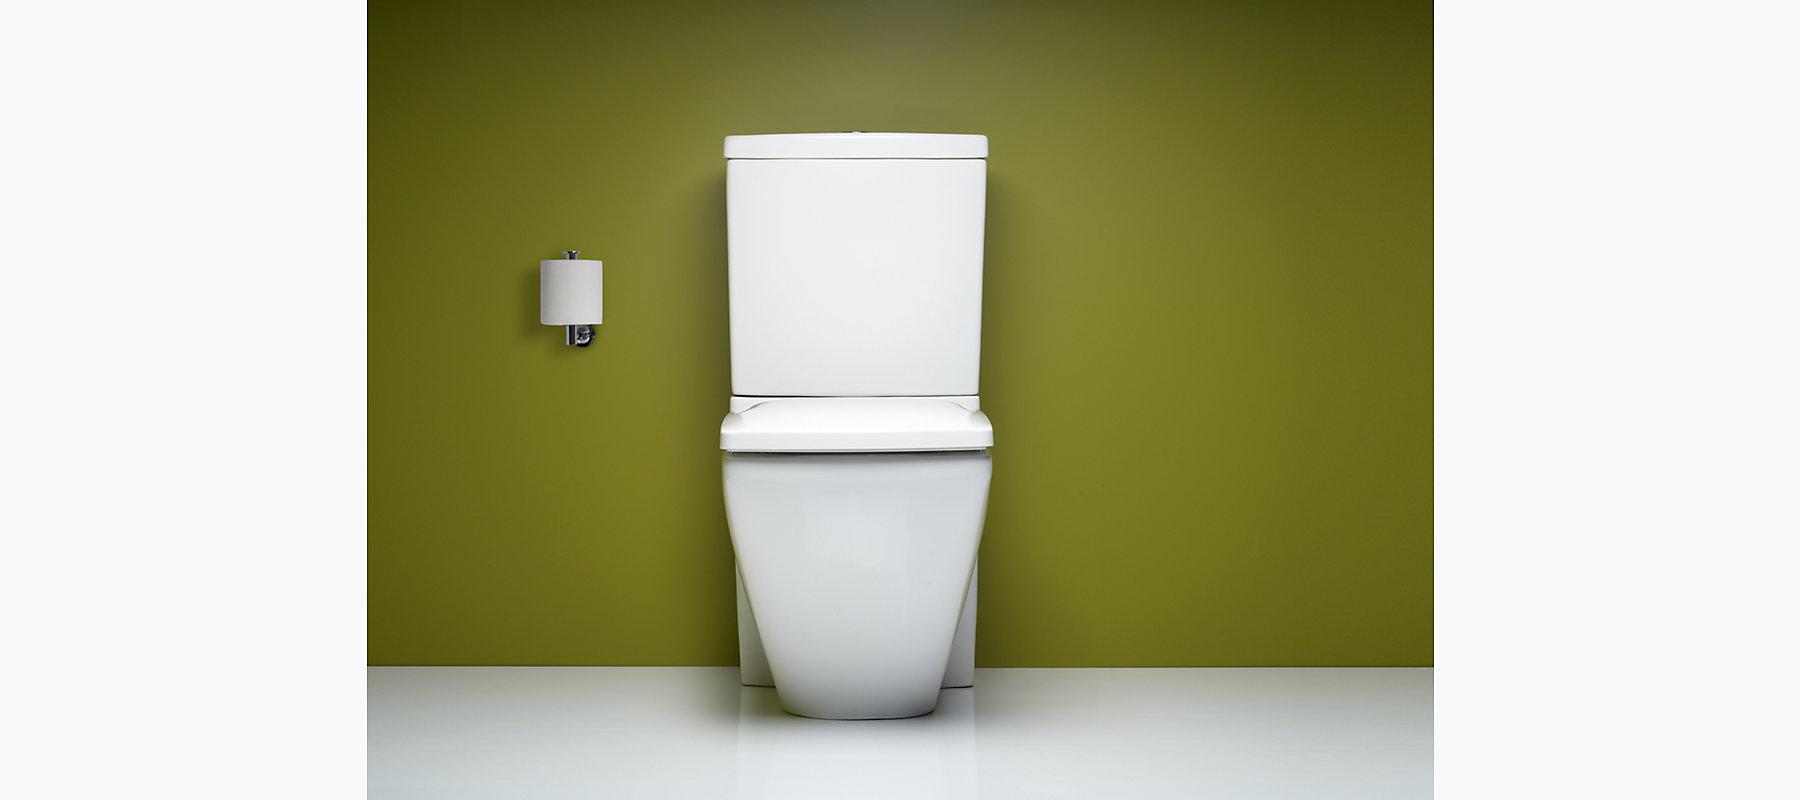 Kohler K 3588 Kohler Escale Two Piece Elongated Toilet